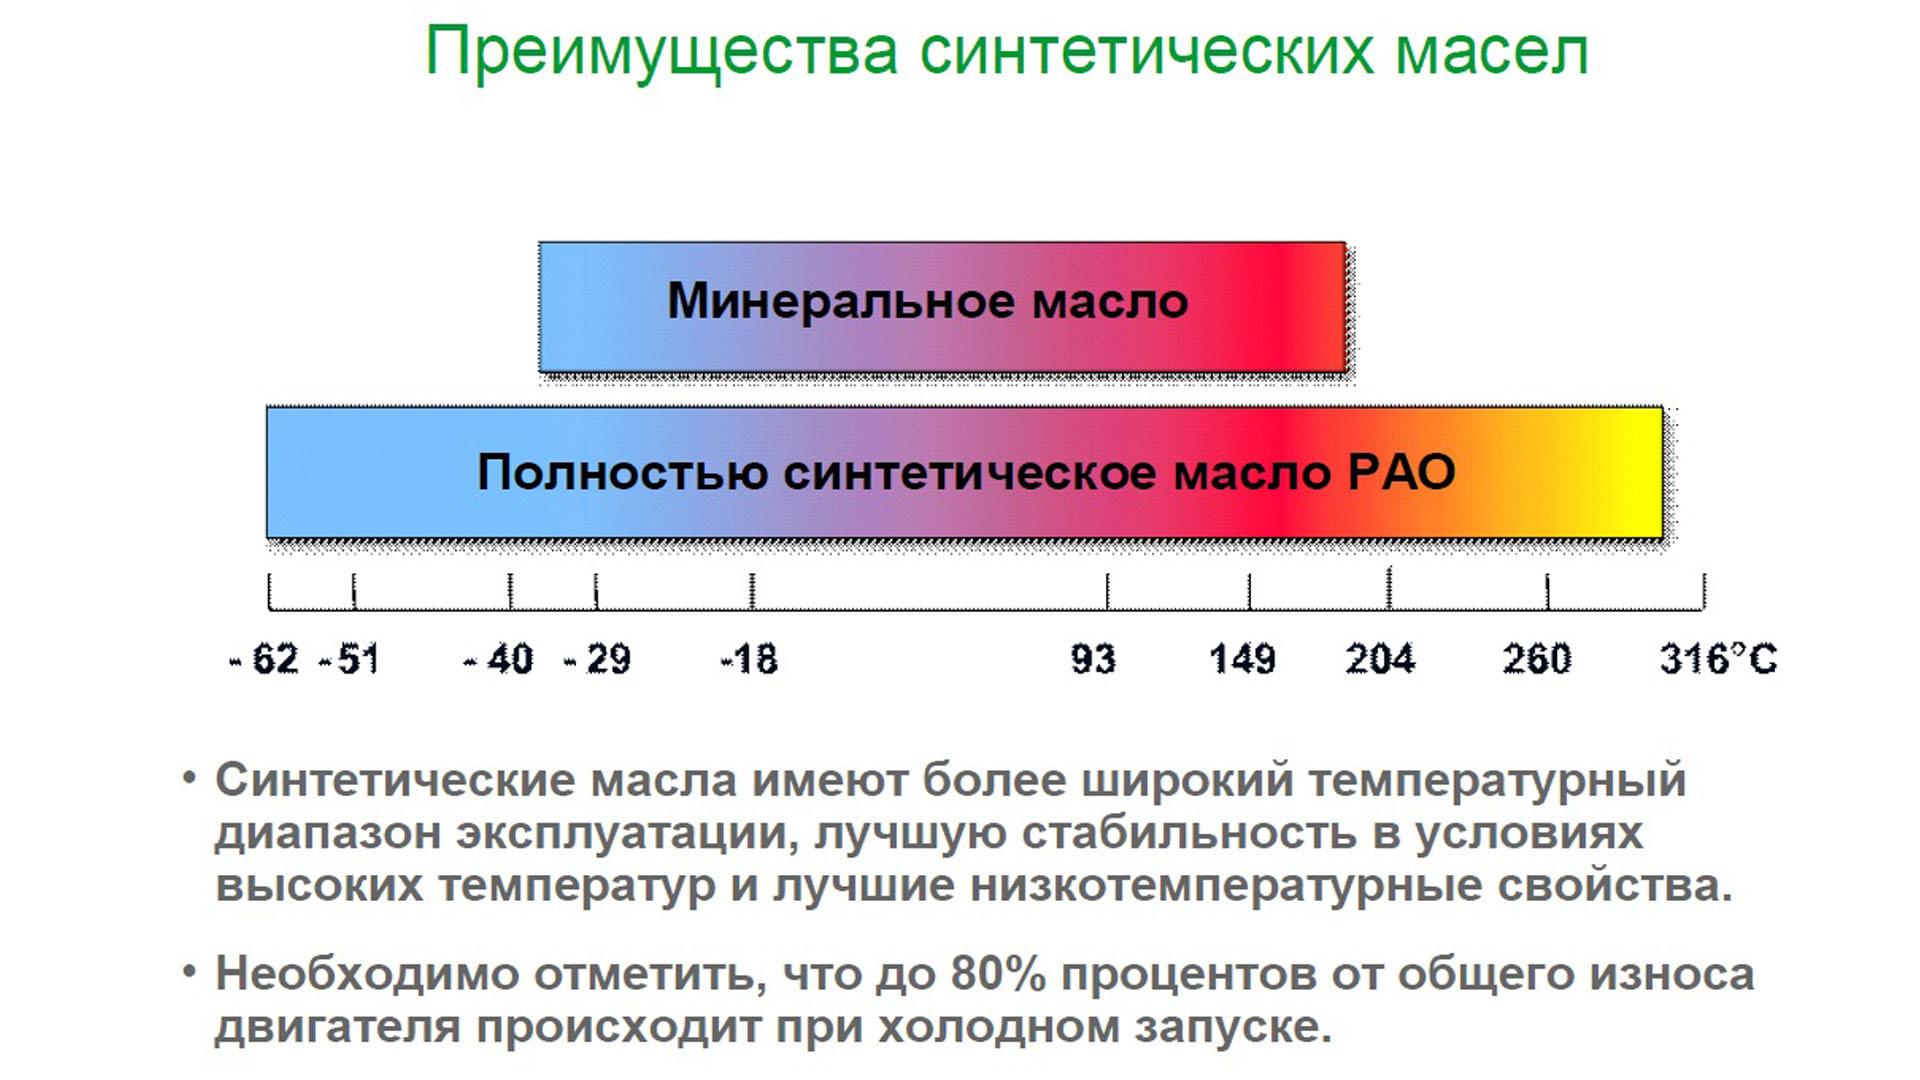 Синтетическое масло 5w40, 5w-30 с температурами